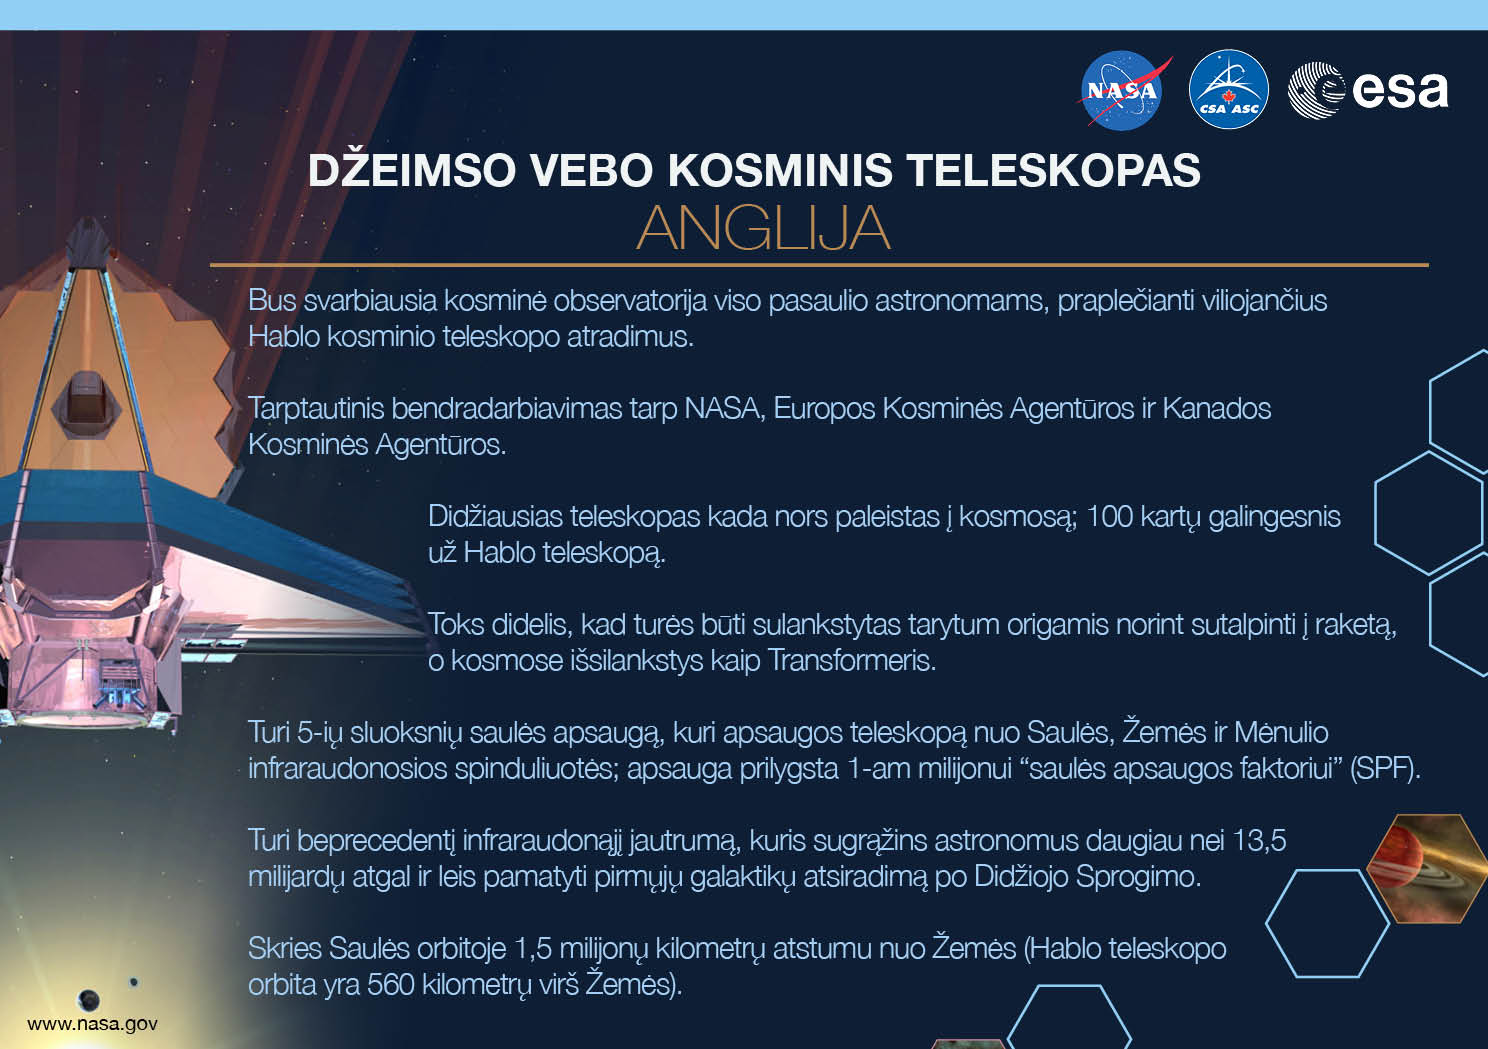 Key Facts International - NASA Webb